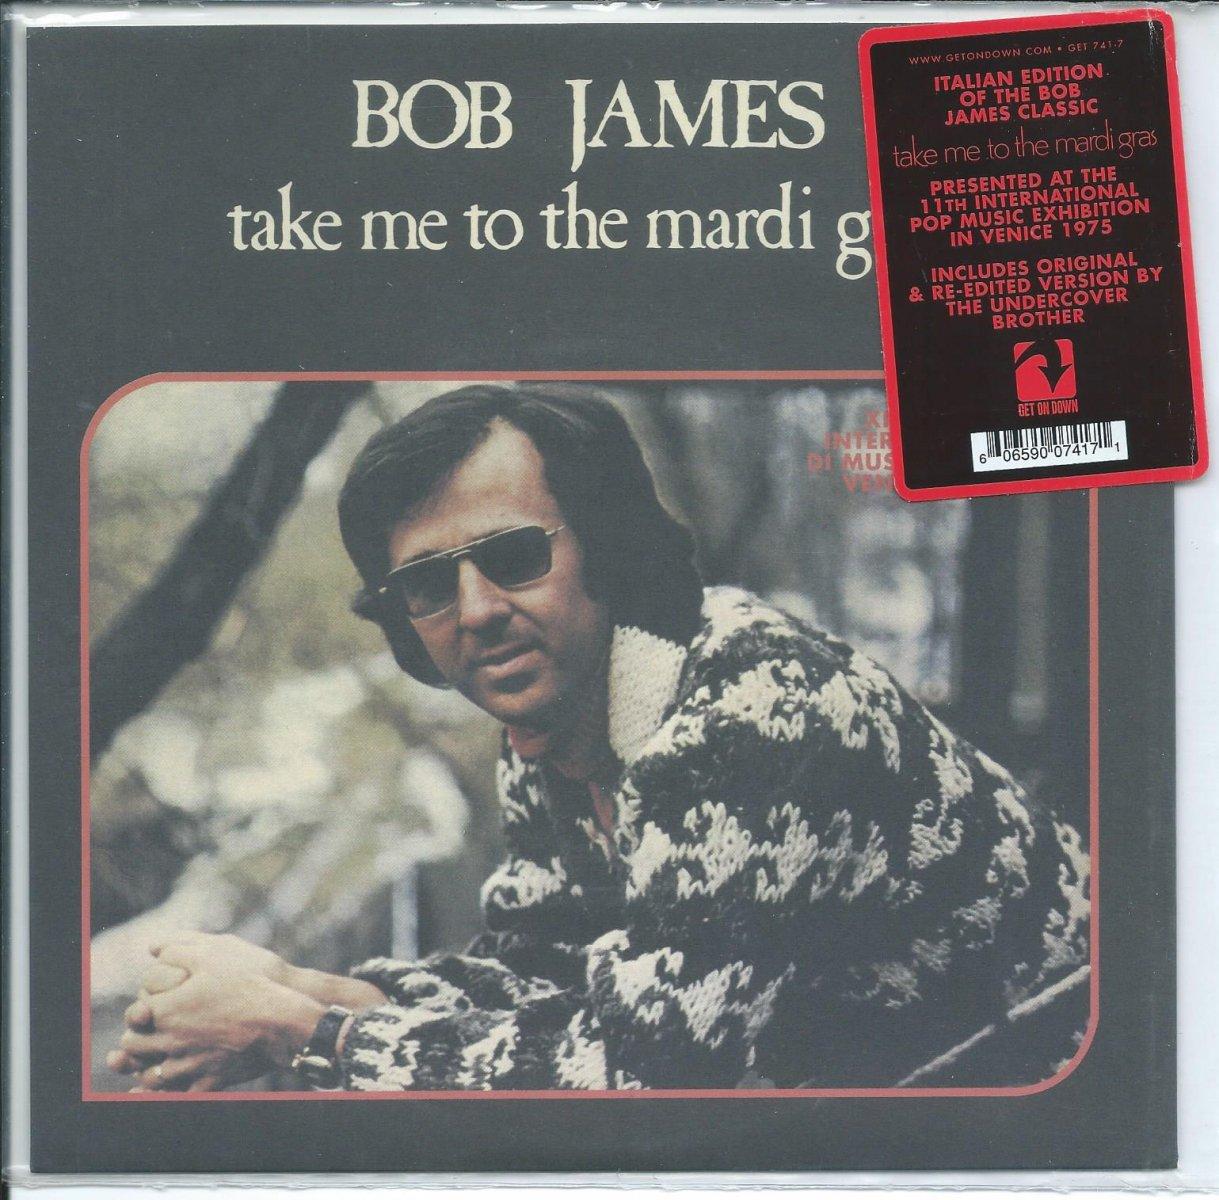 BOB JAMES / TAKE ME TO THE MARDI GRAS (7